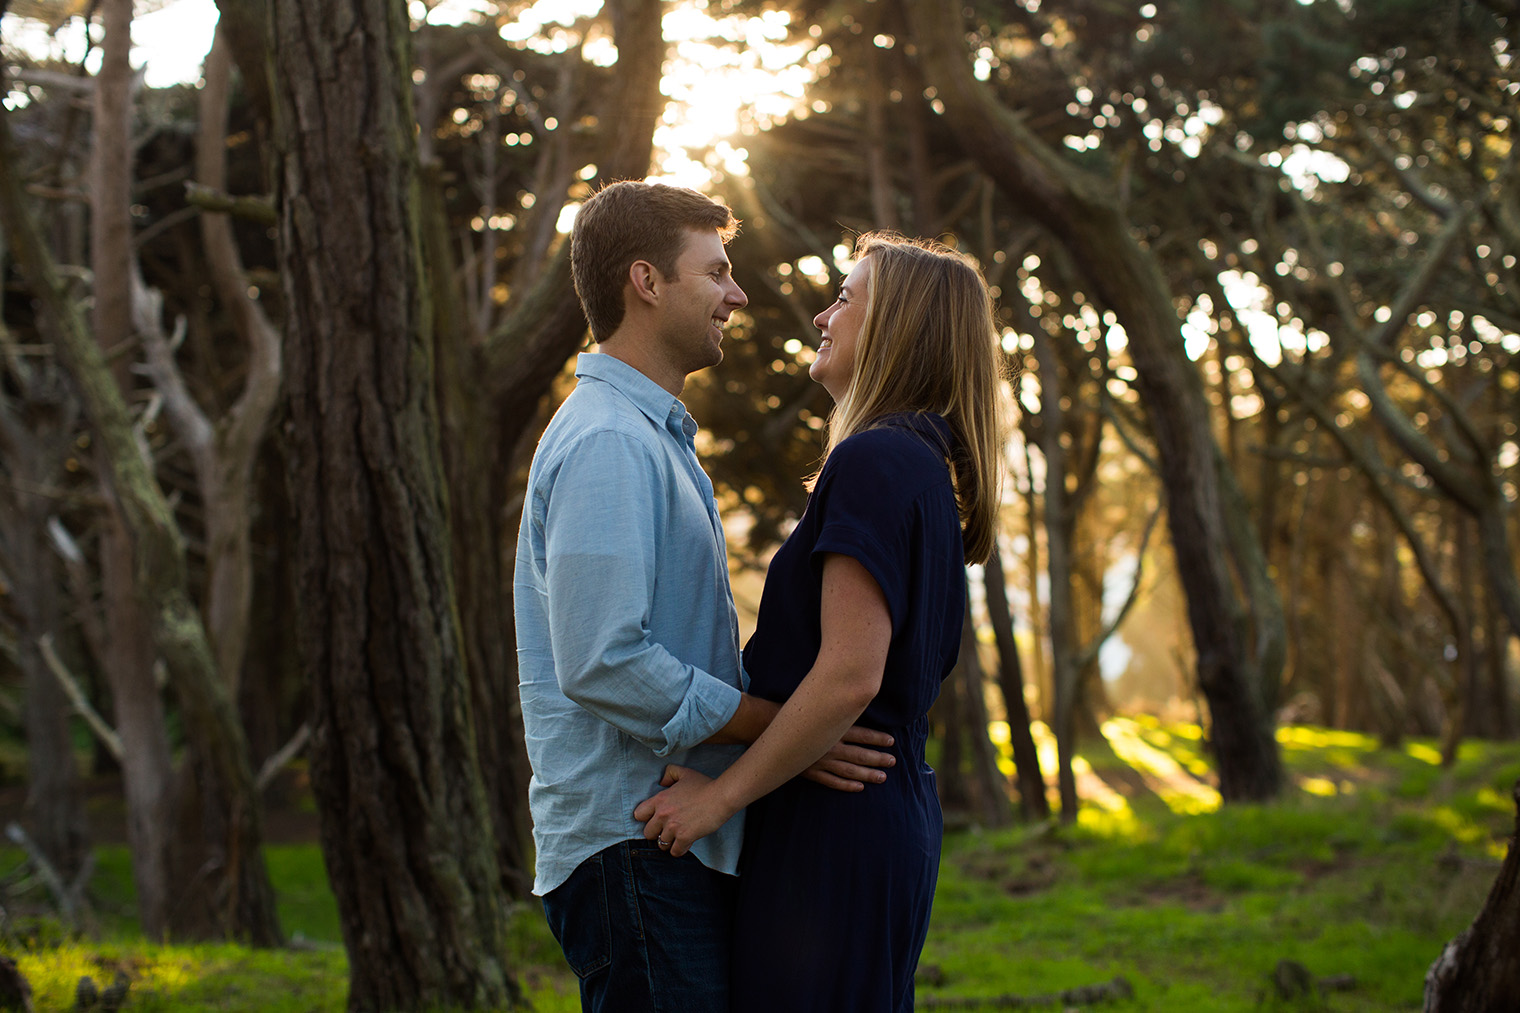 Golden Gate Park Engagement Session